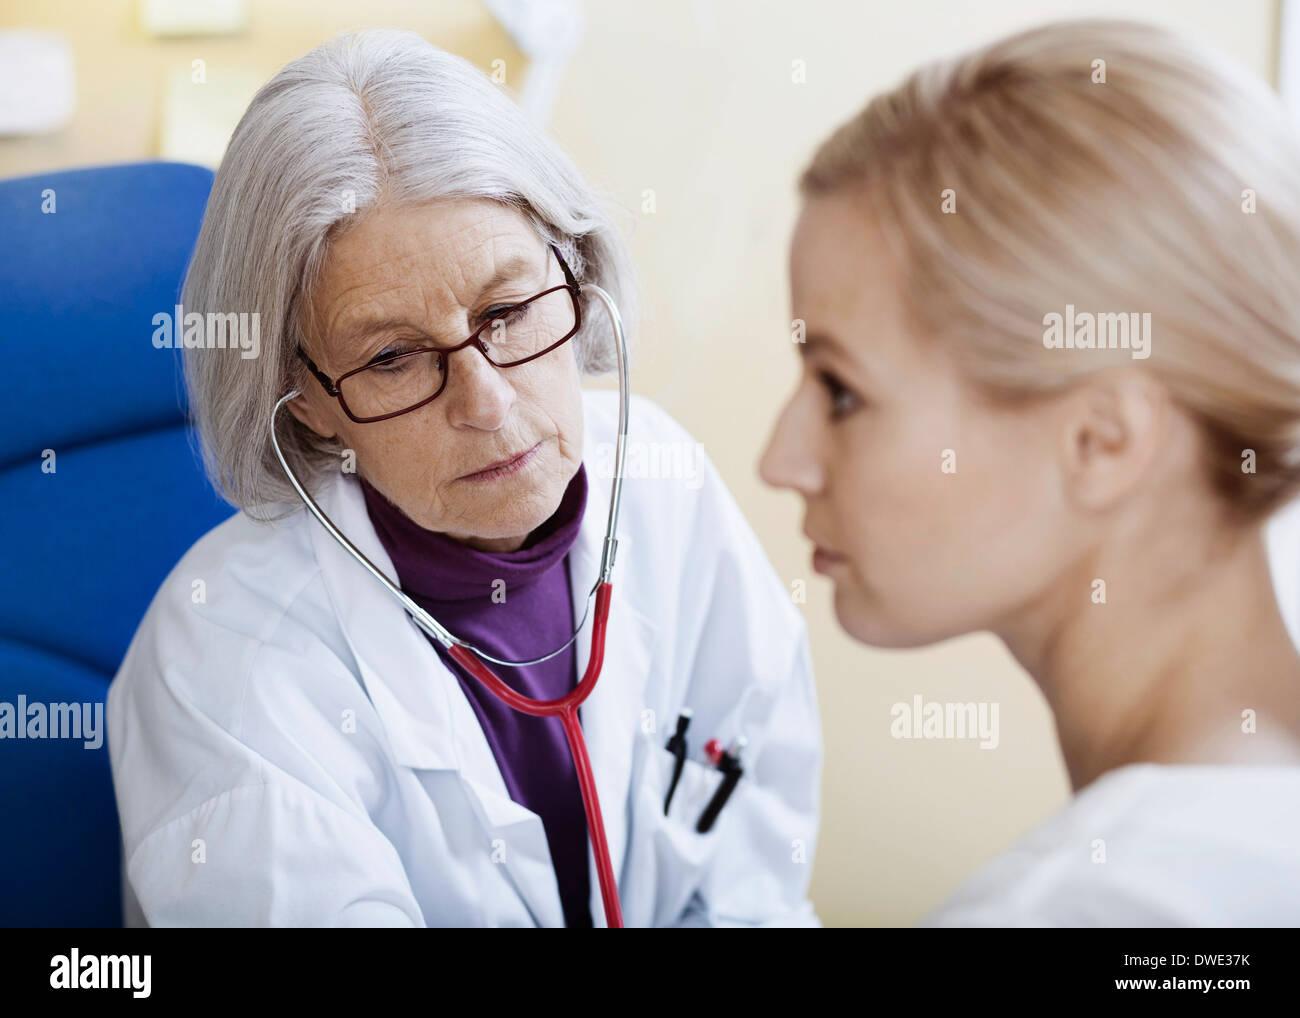 Senior female doctor examining patient in clinic - Stock Image